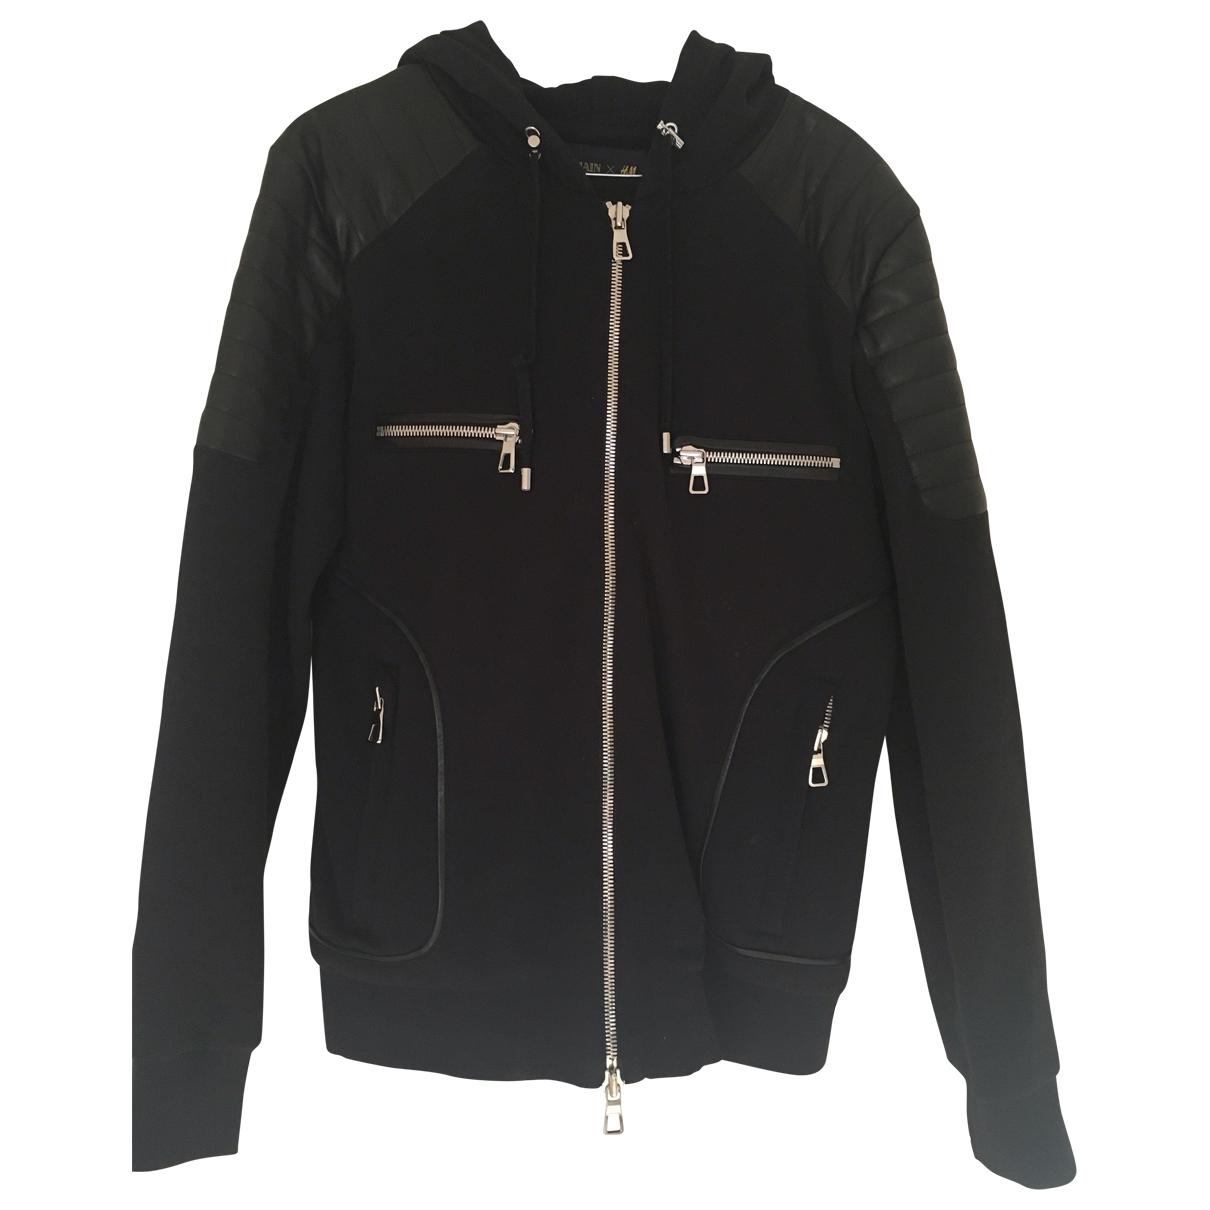 Balmain For H&m \N Black Cotton jacket  for Men S International